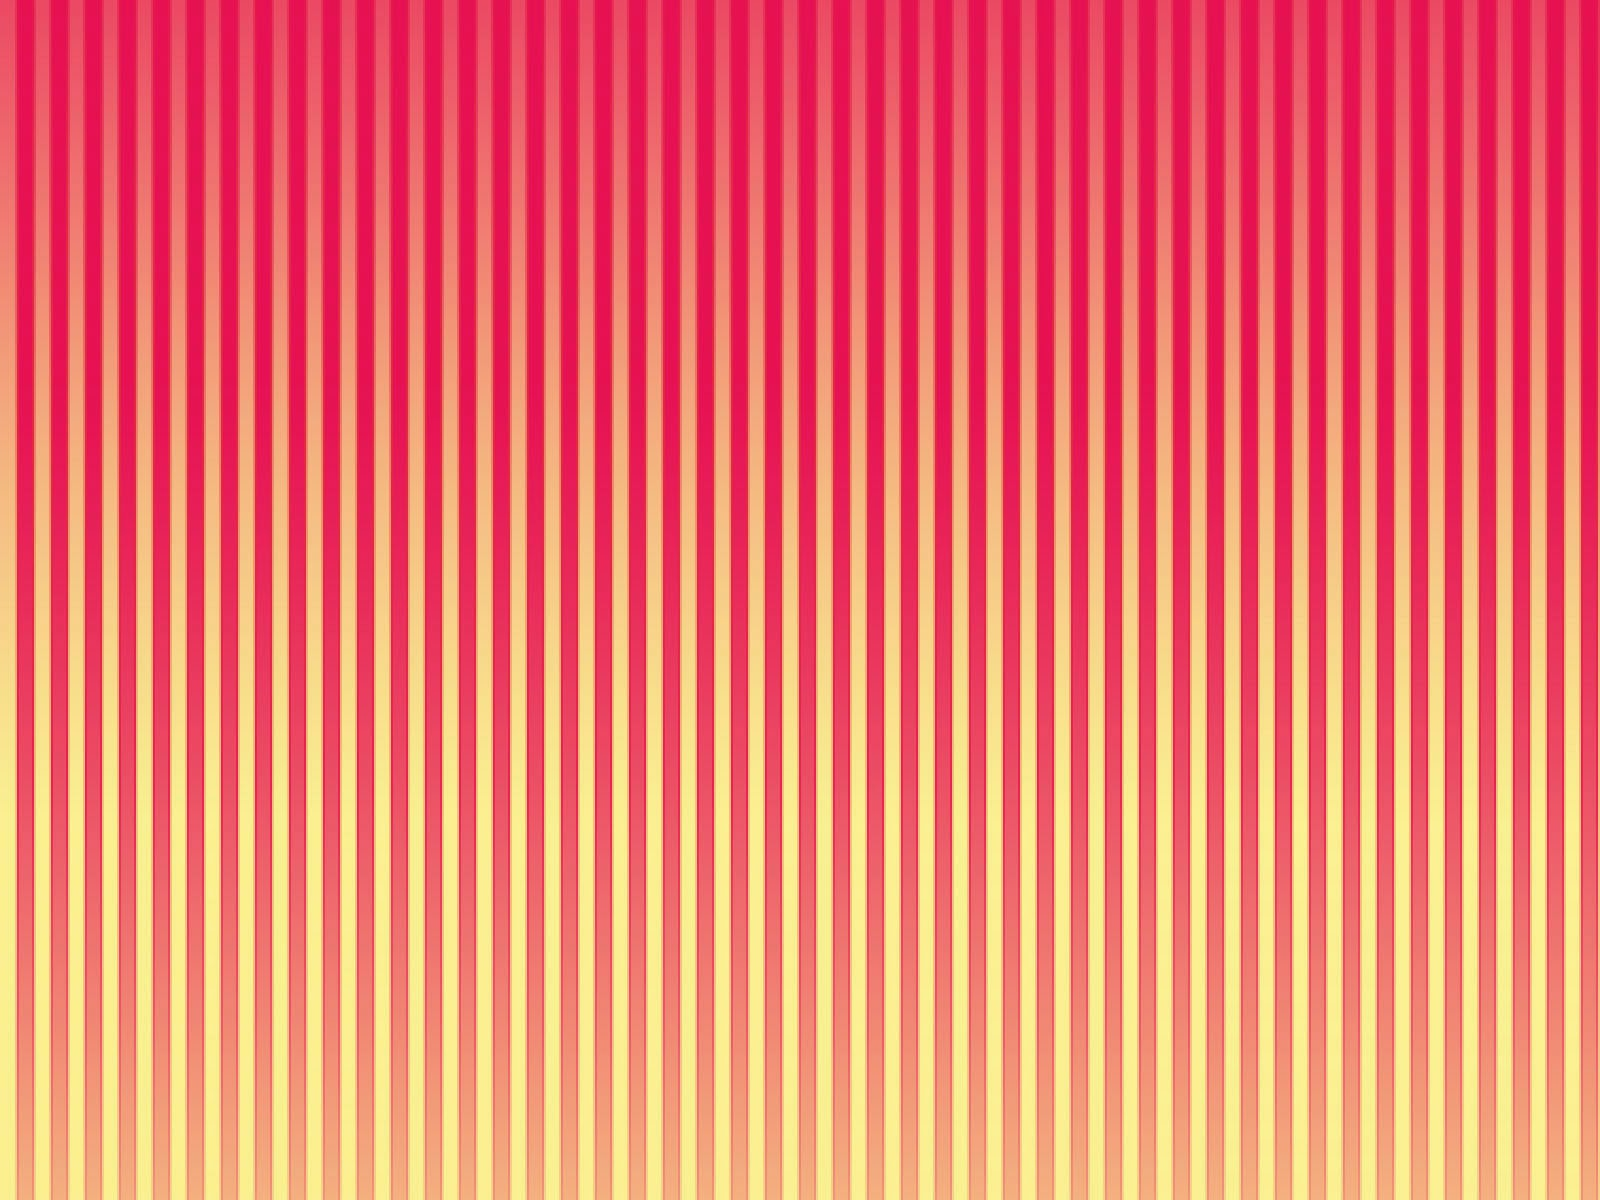 Yellow Stripe Wallpaper: Sh Yn Design: Stripe Wallpaper